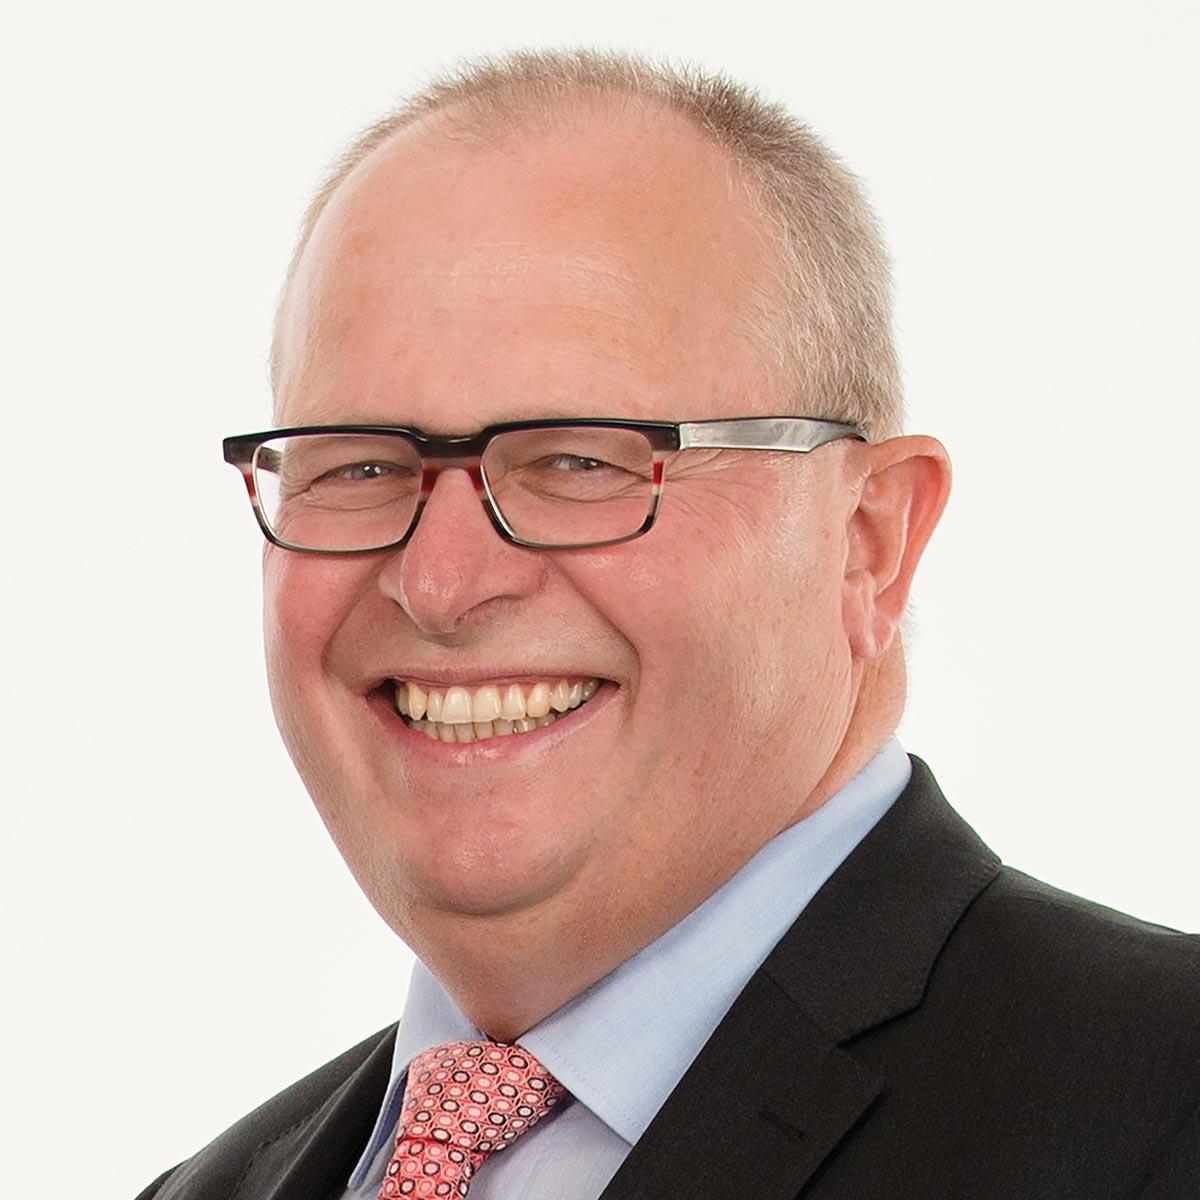 Jürgen Fluhr